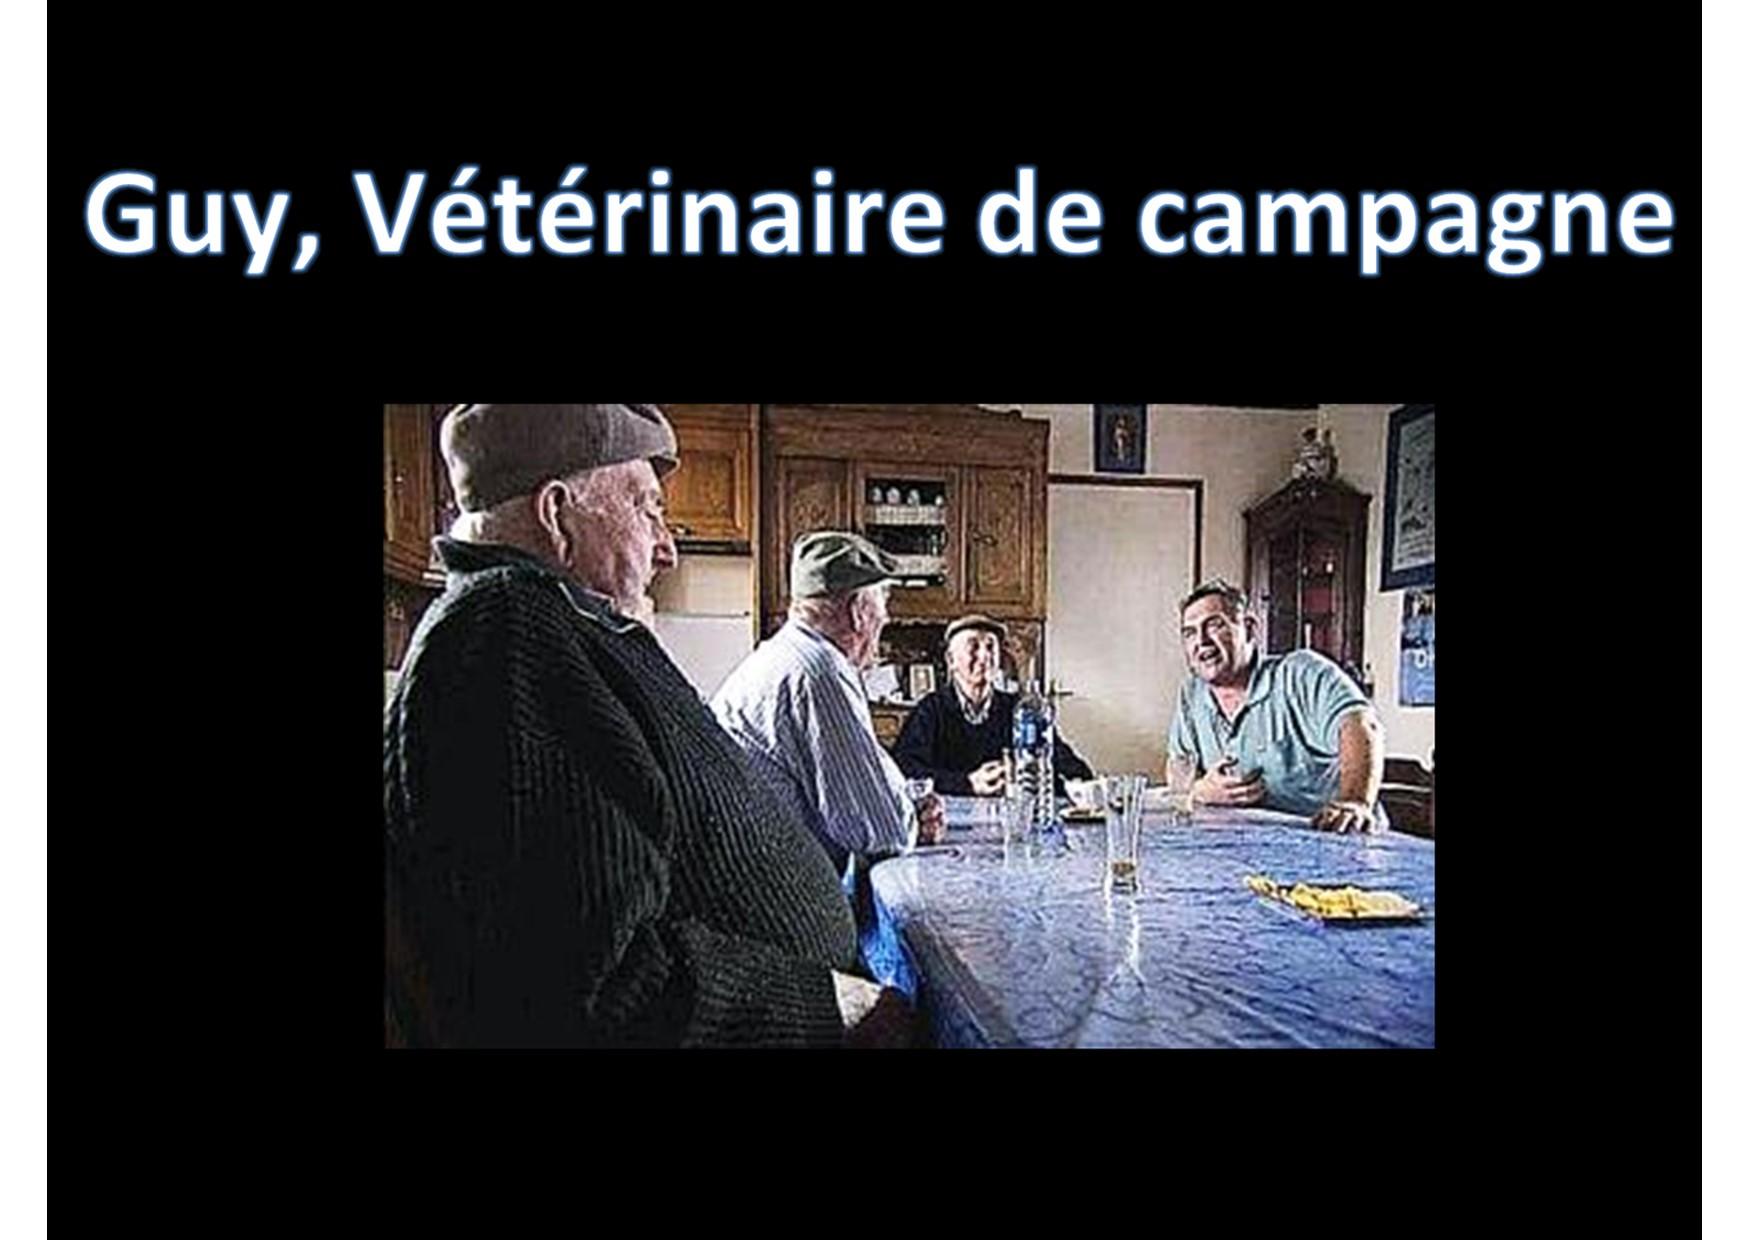 Guy veterinaire